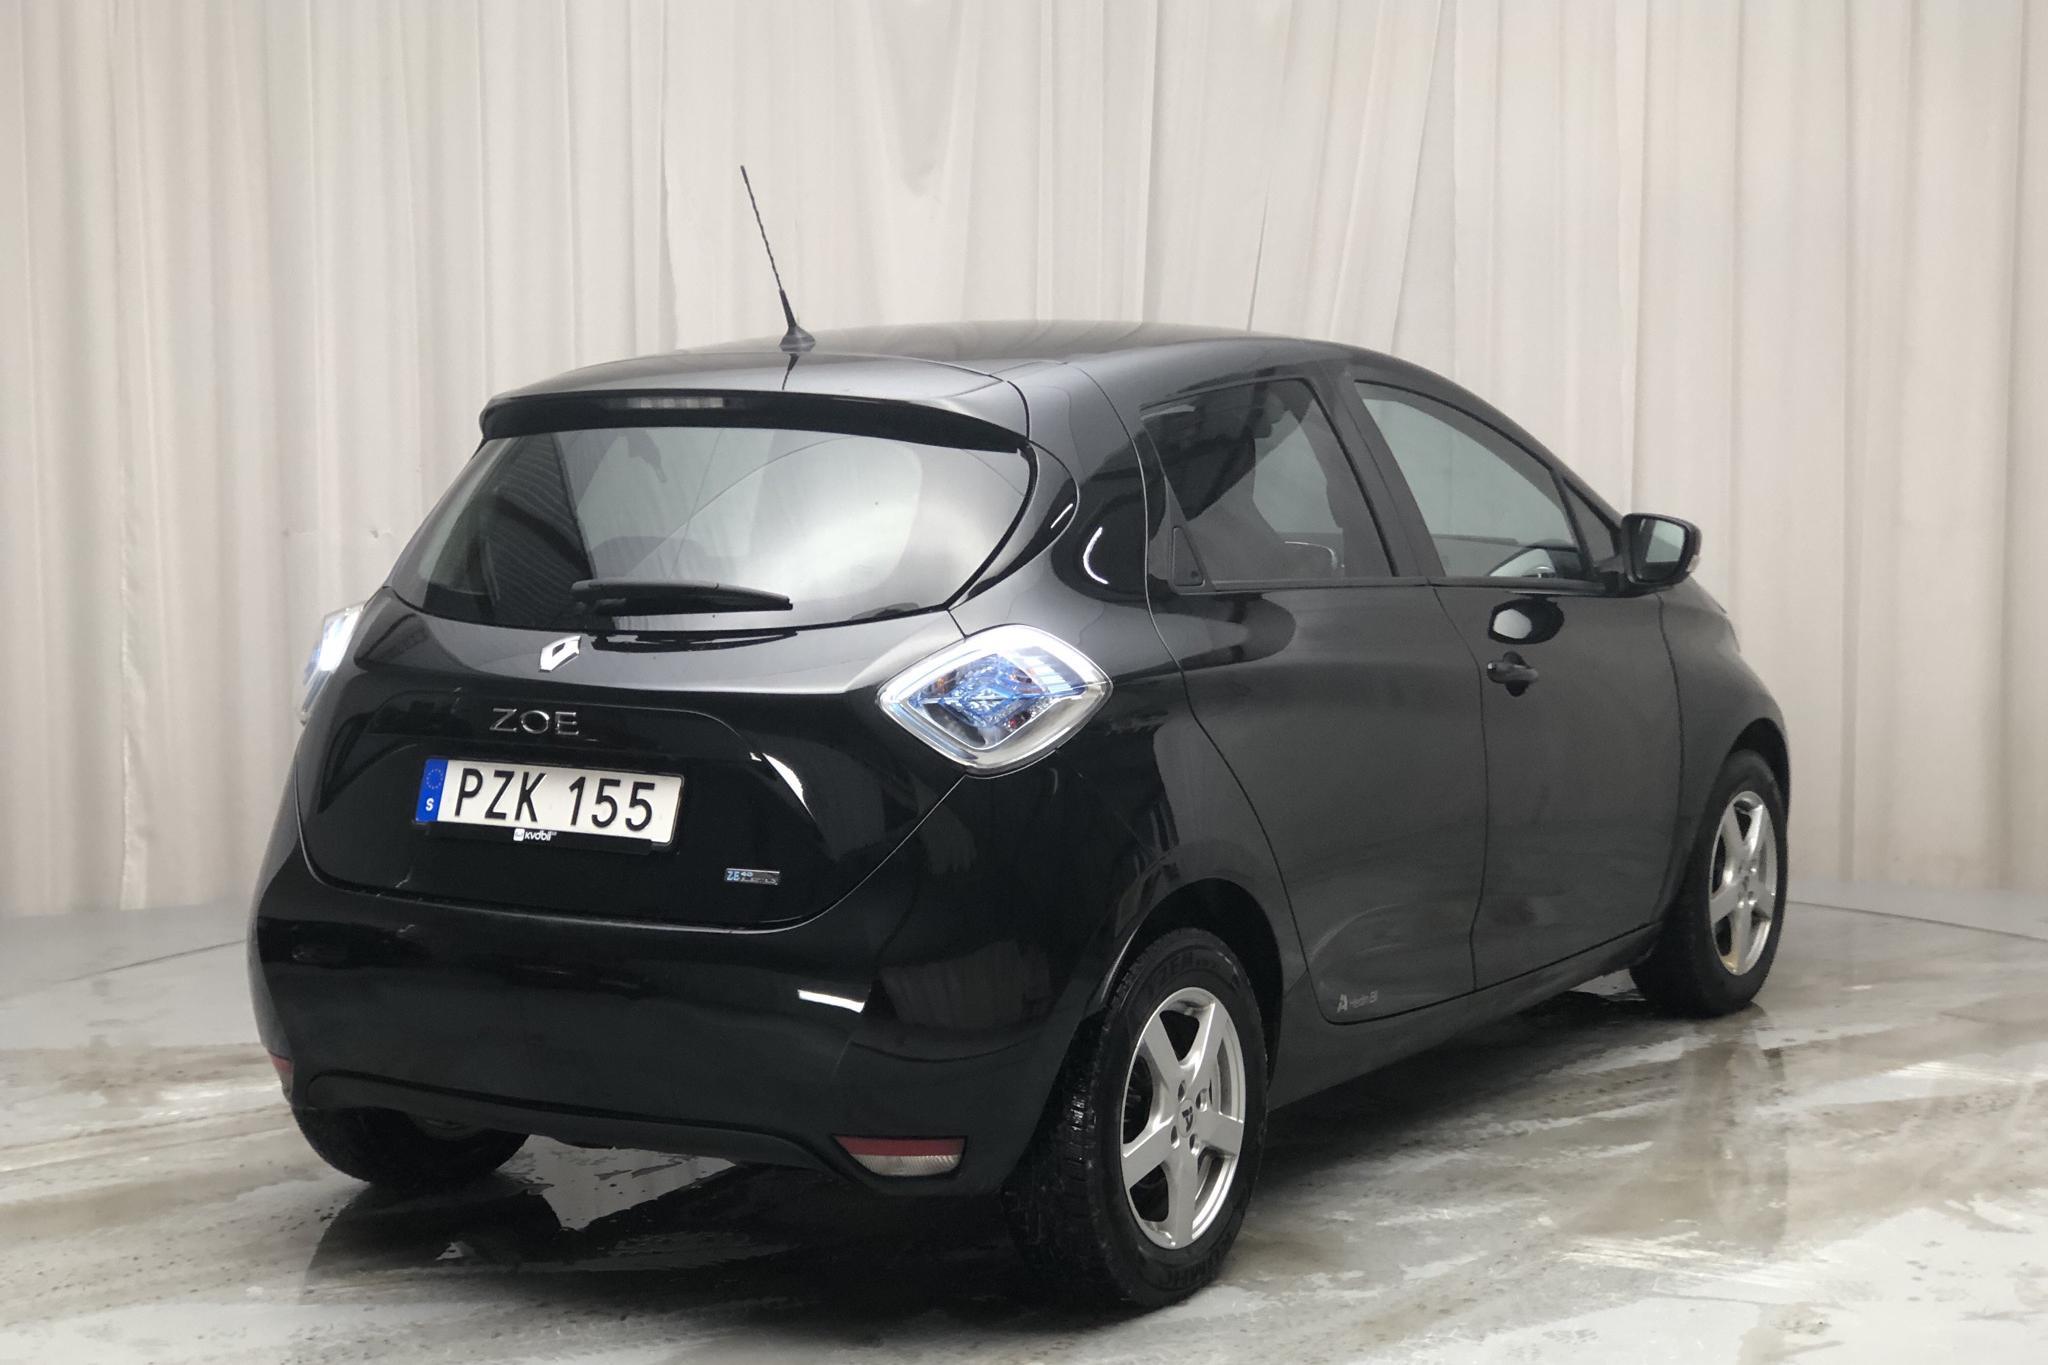 Renault Zoe 41 kWh R90 (92hk) - 10 547 mil - Automat - svart - 2017